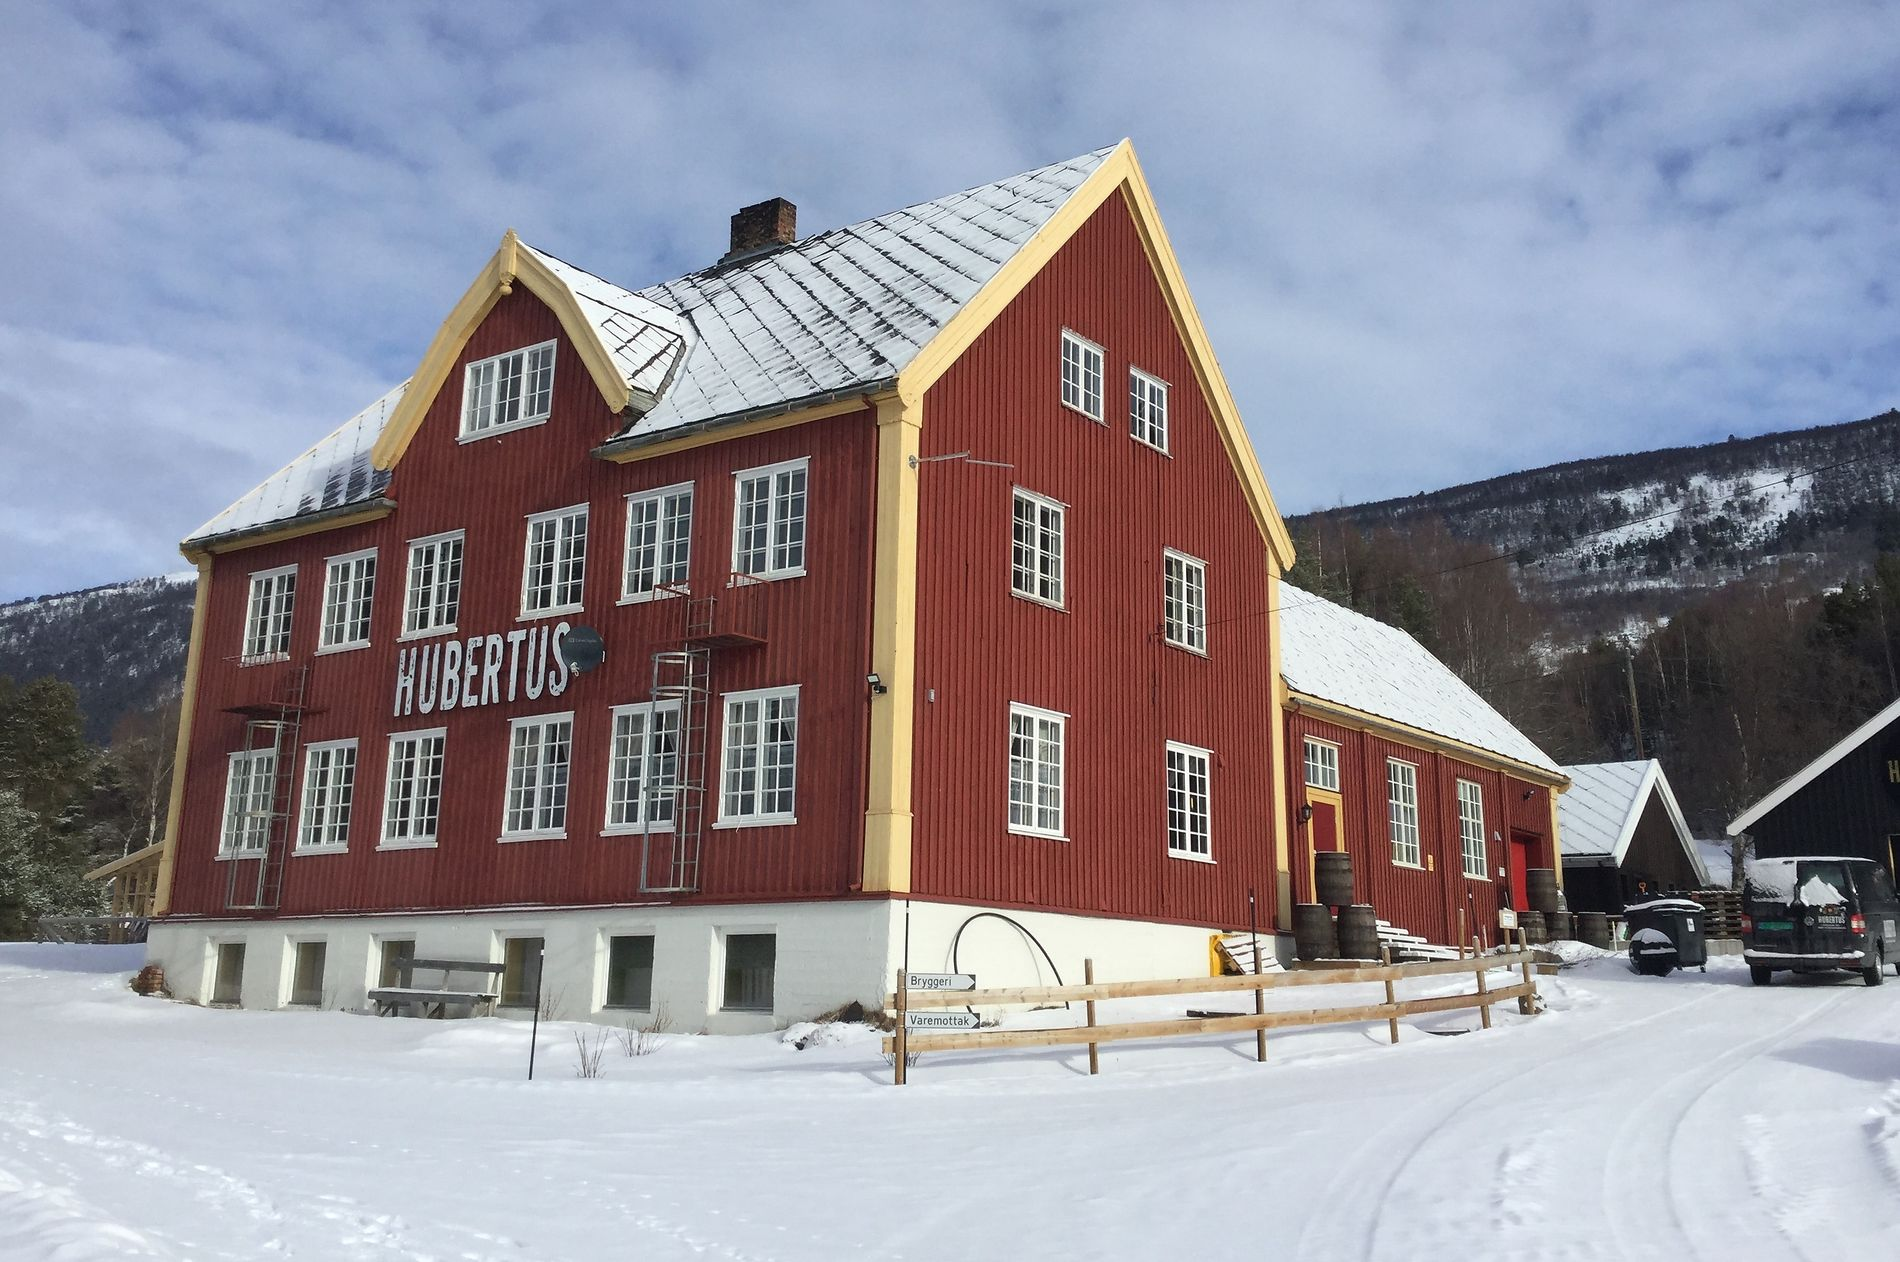 FRA ELEVER TIL ØL: Den store skolen på Dovre ble fylt med ny aktivitet og en hollandsk familie som startet bryggeri med gymsalen som bryggerihall.